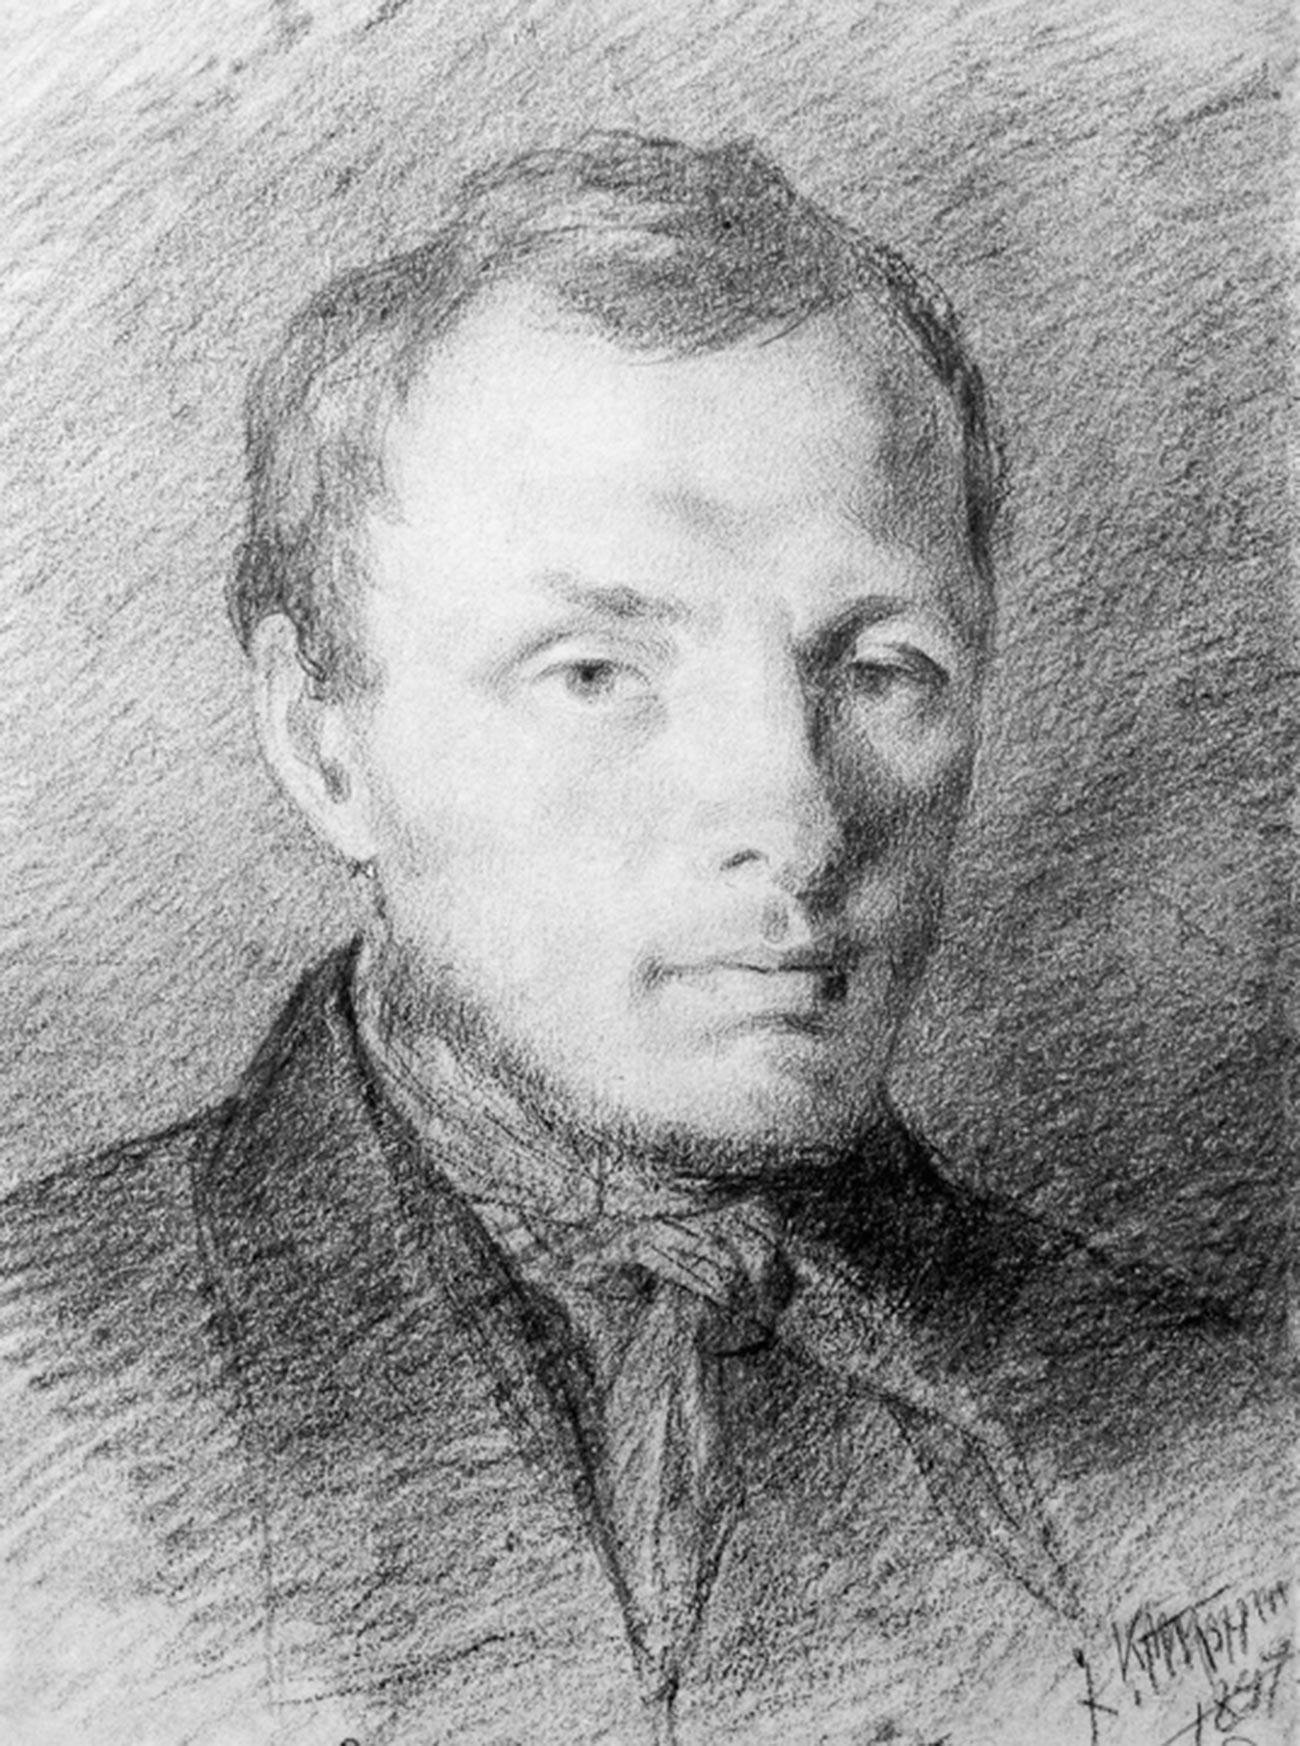 Портрет Фјодора Михајловича Достојевског